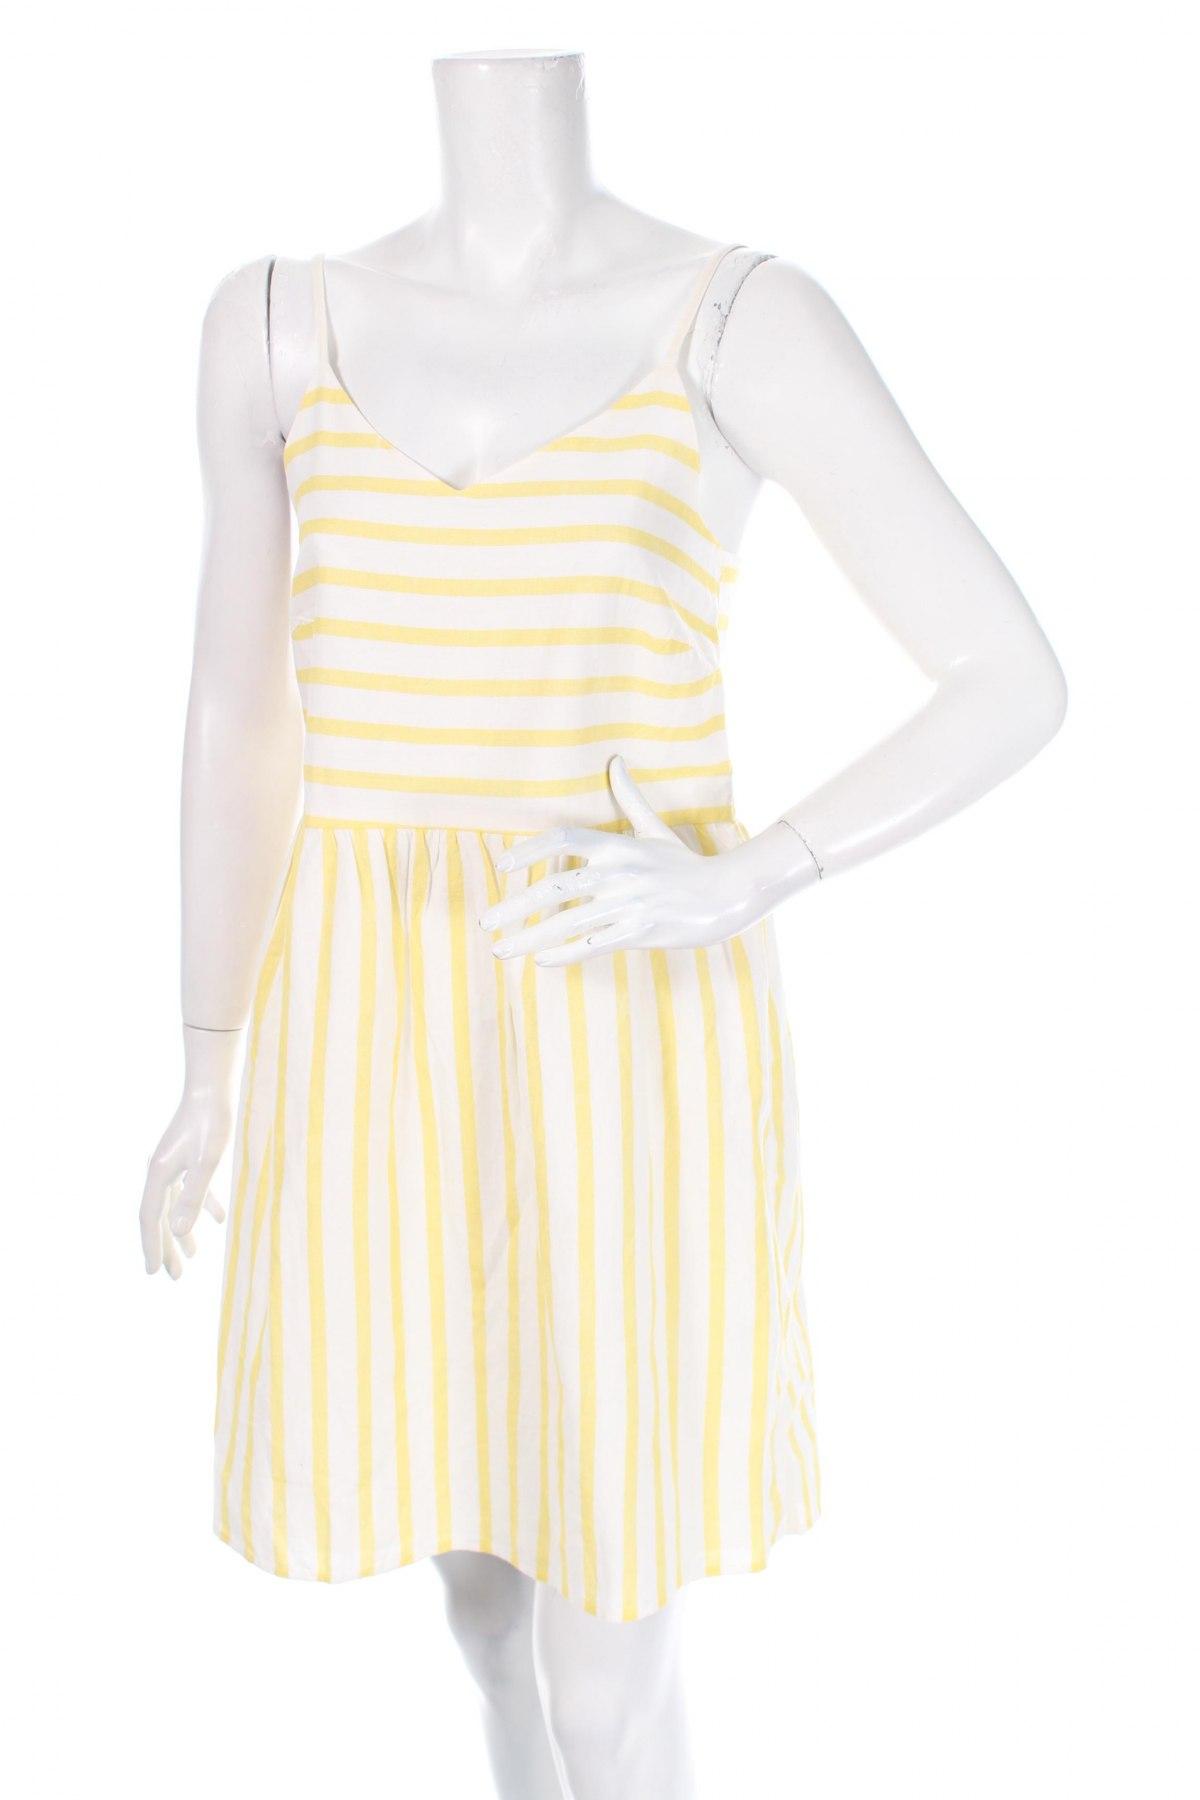 add3bb31f Šaty Vero Moda - za výhodné ceny na Remix - #103664934